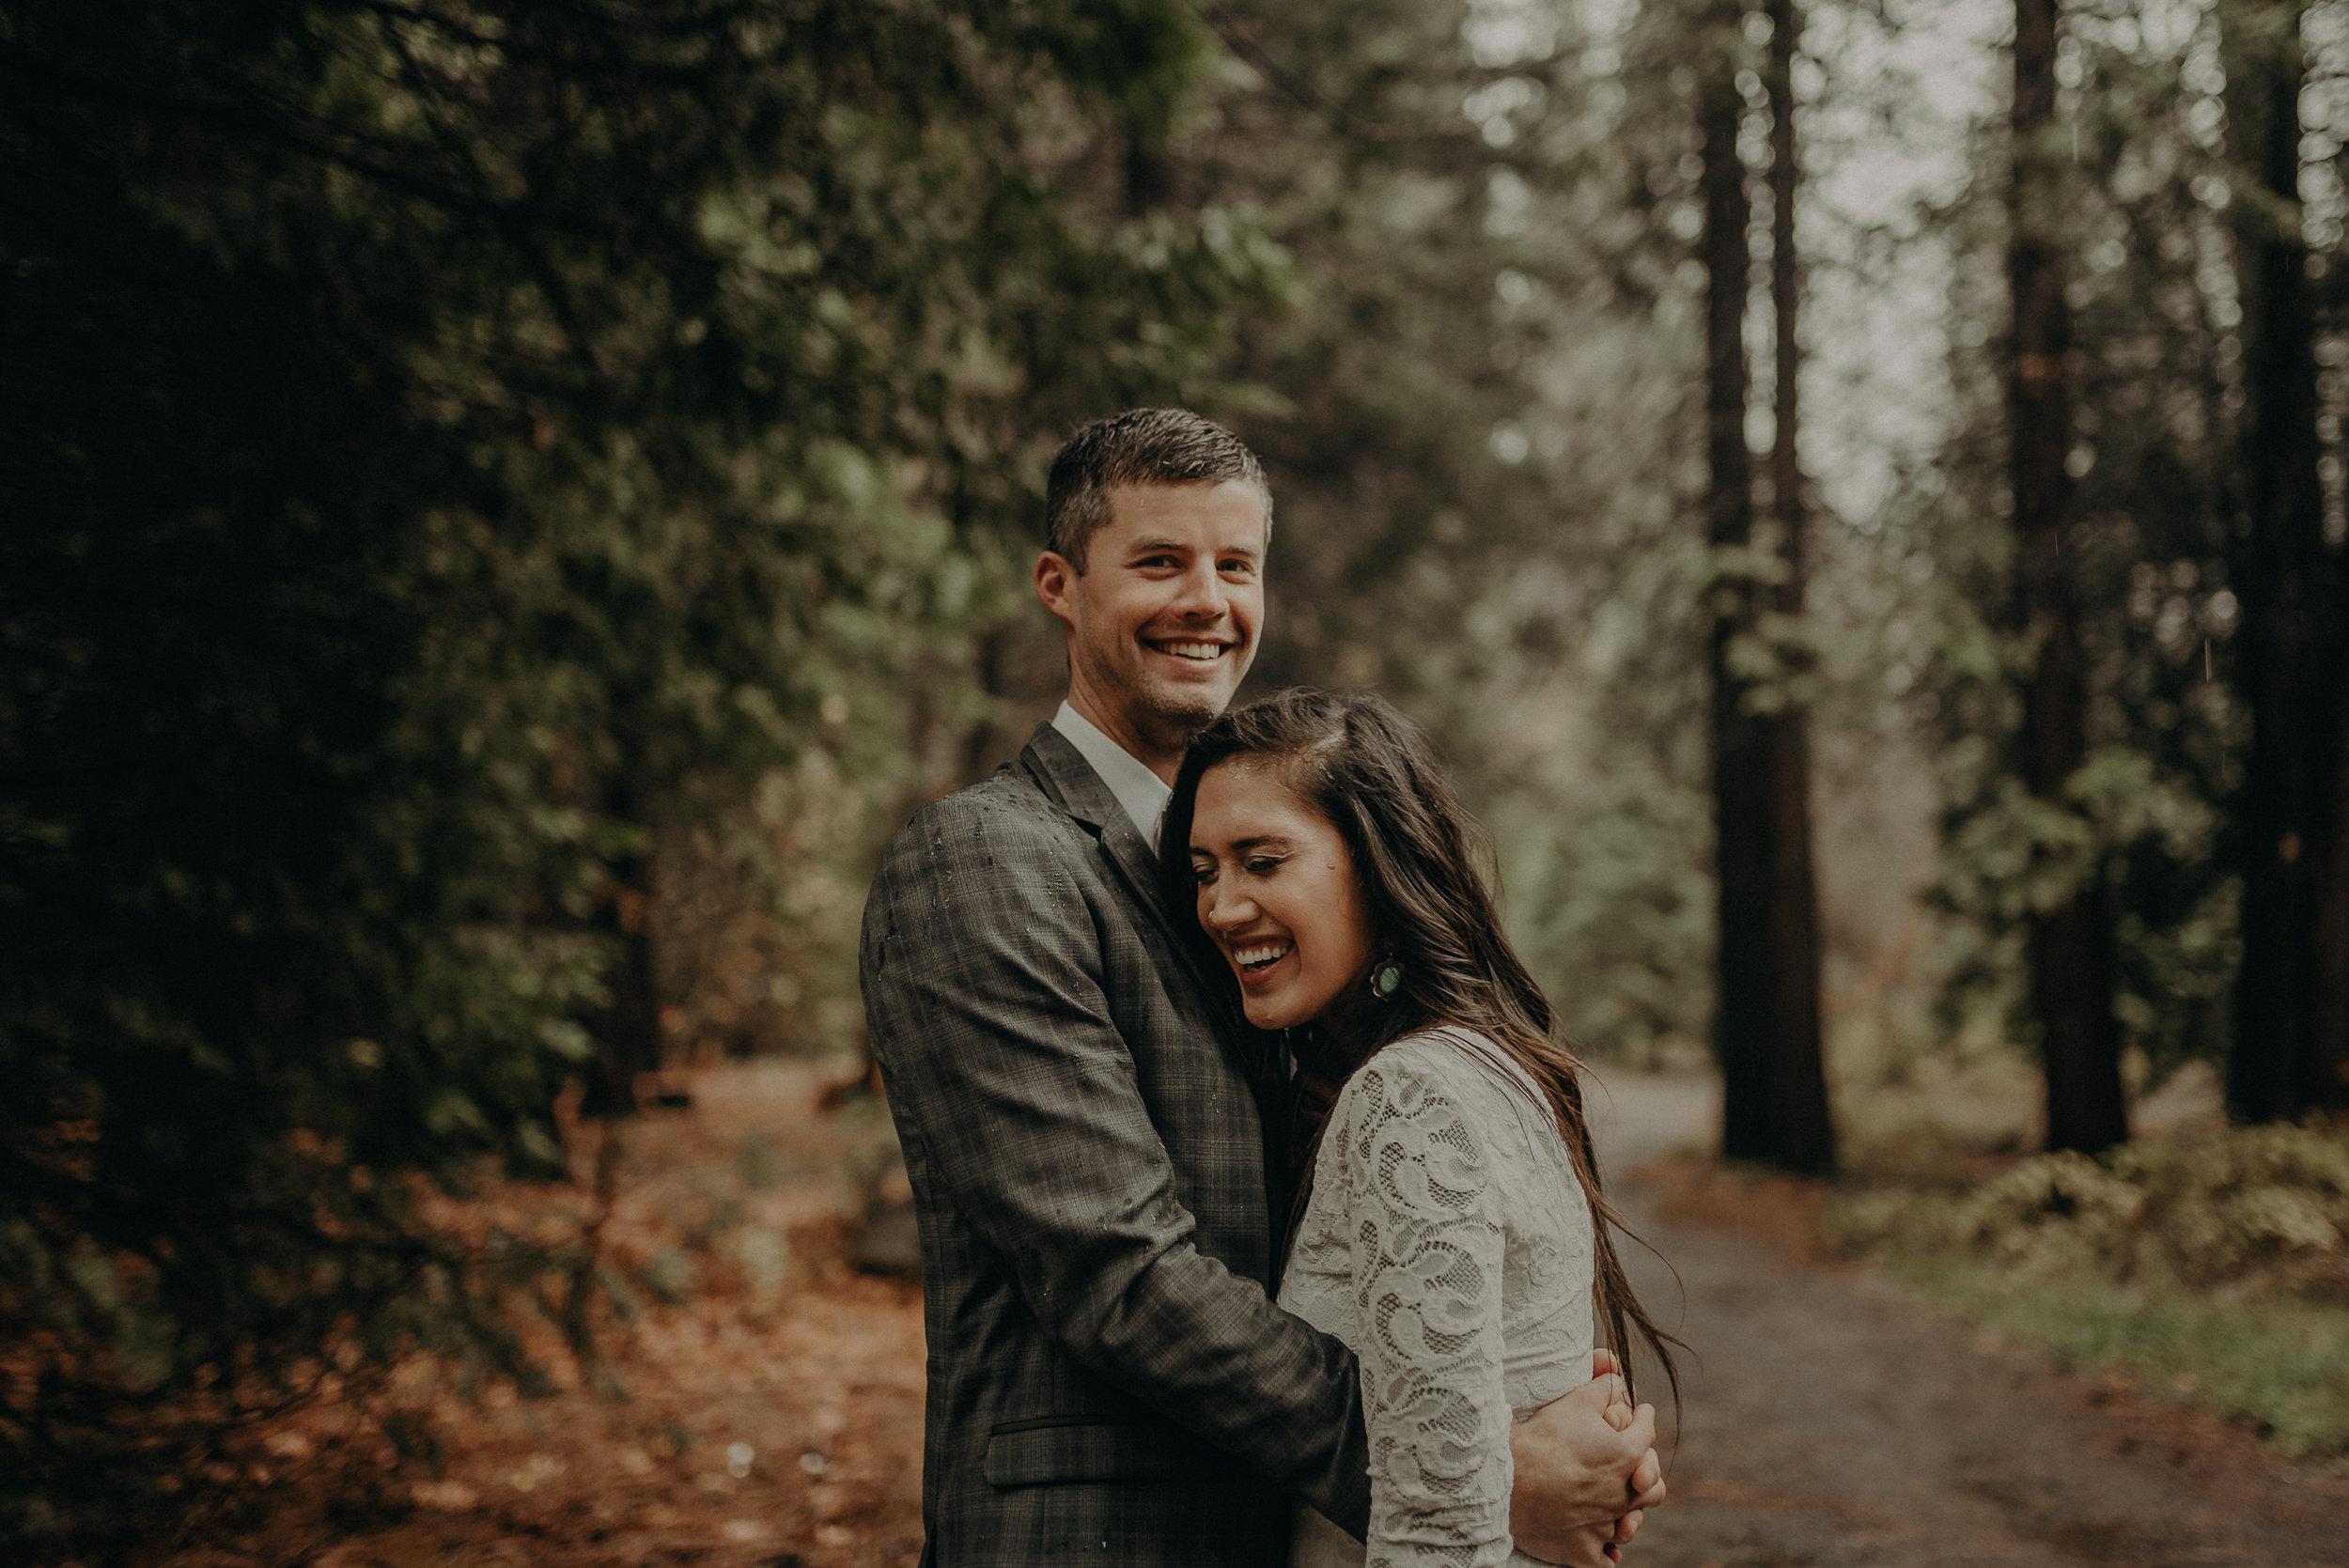 Isaiah + Taylor Photography - Yosemite Elopement - Los Angeles Wedding Photographer-15.jpg